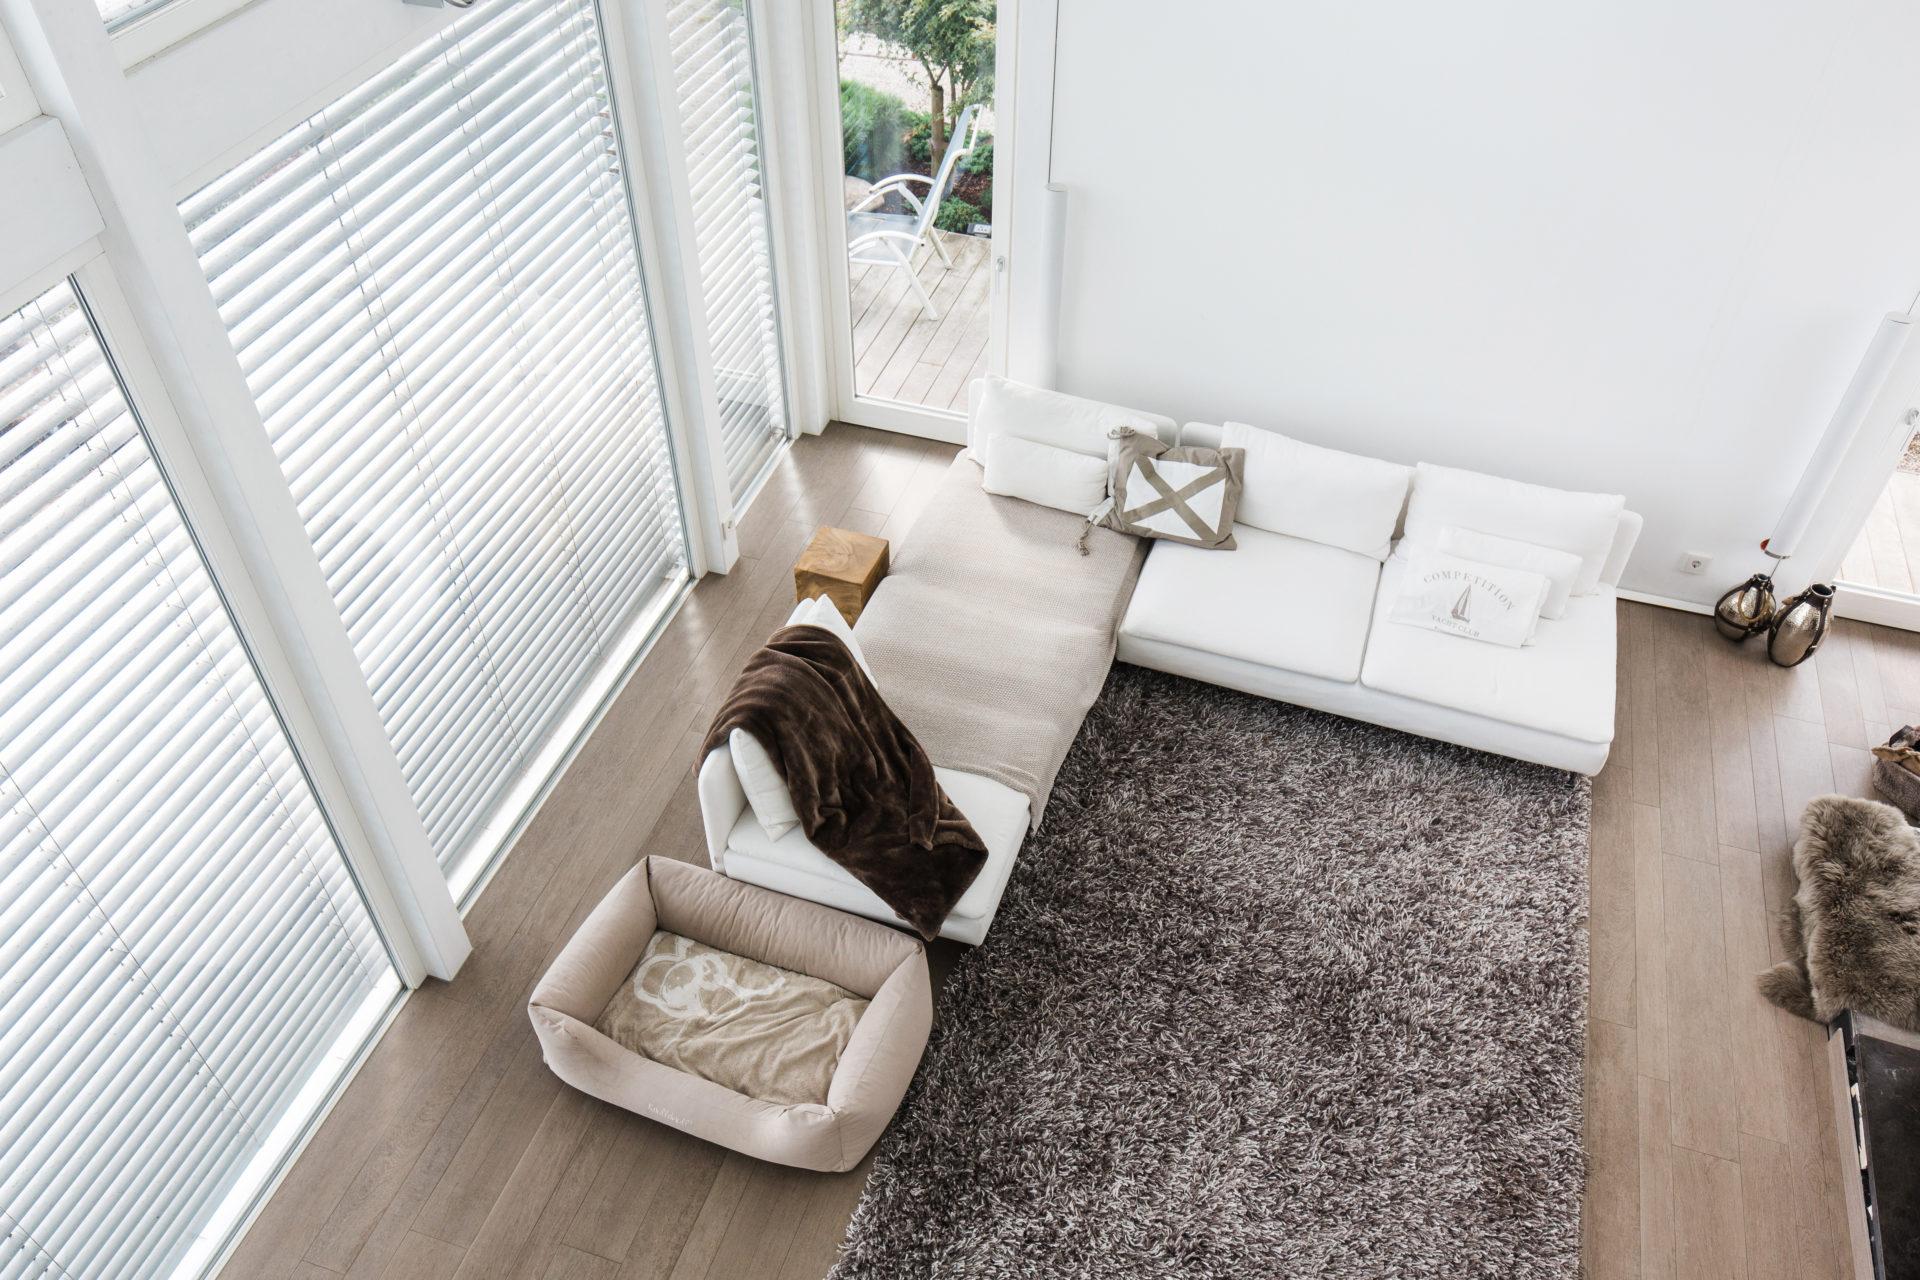 innenausbau concentus hausbau fachwerkhaus holz skelett concentus moderne fachwerkh user. Black Bedroom Furniture Sets. Home Design Ideas